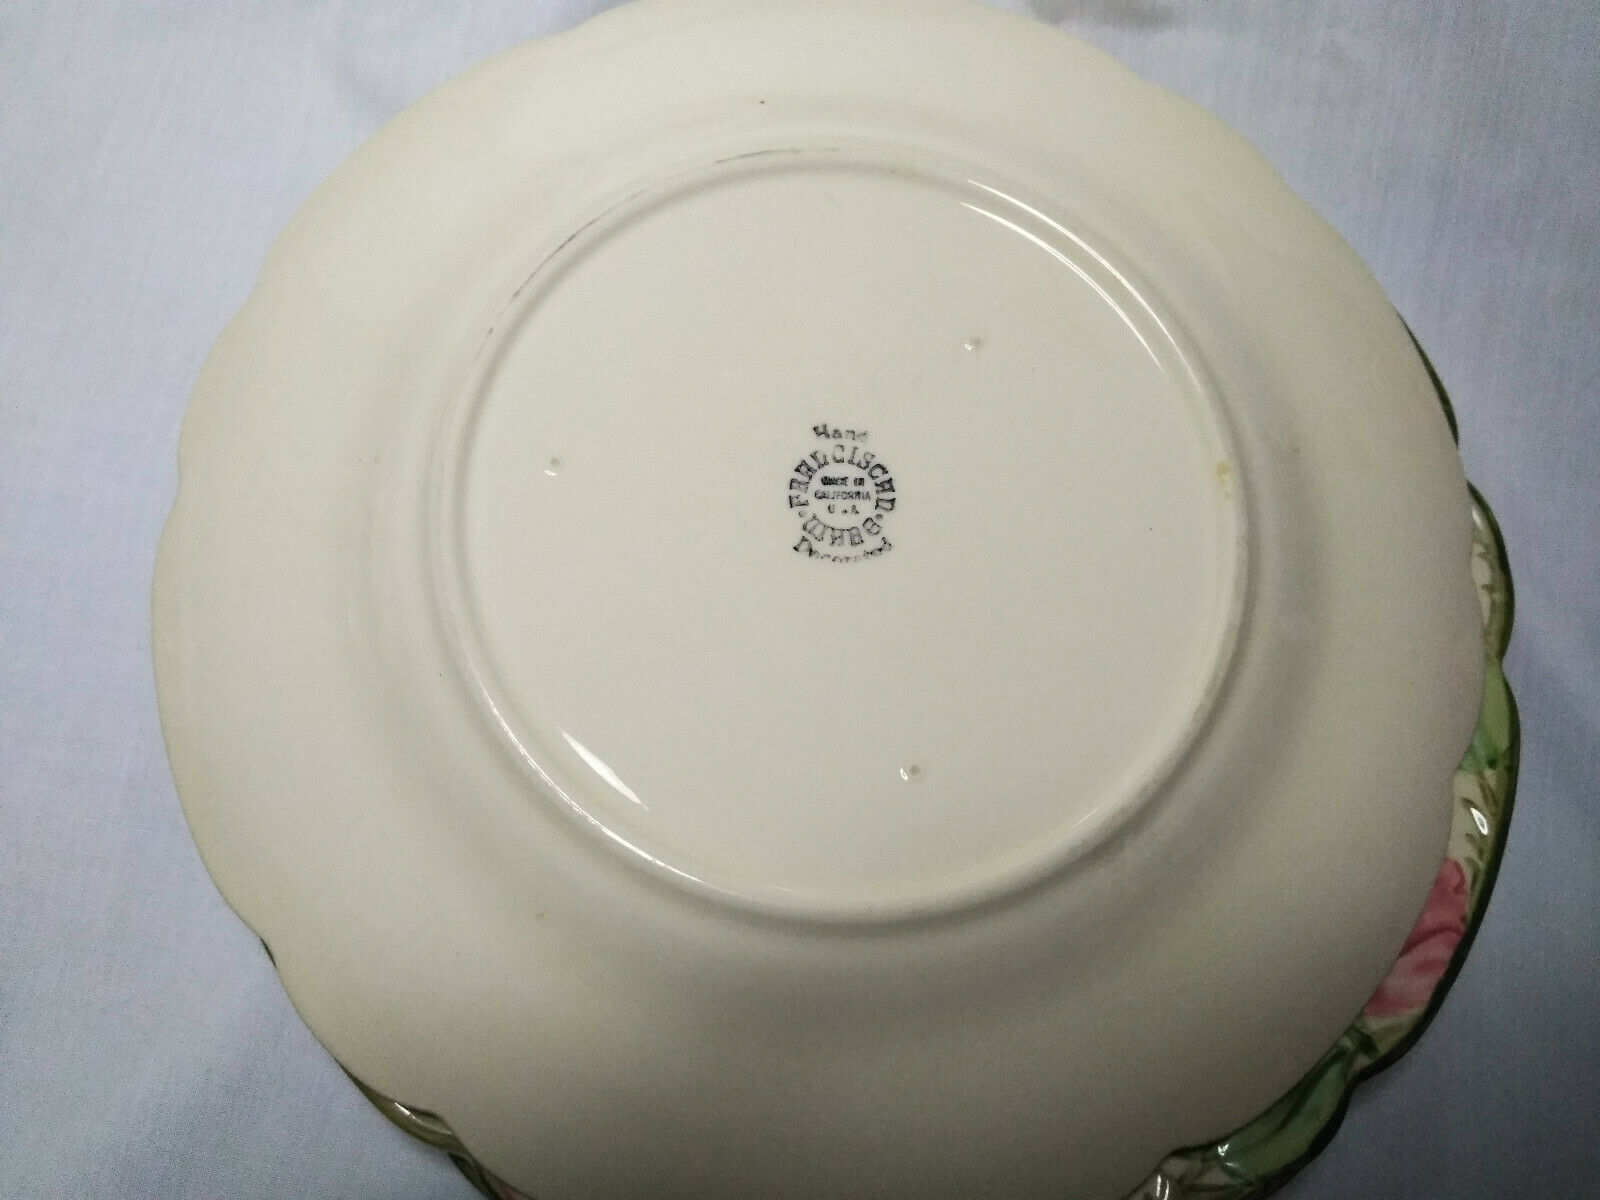 Vintage Franciscan China Desert Rose Single 10.5 inch Dinner Charger Plate